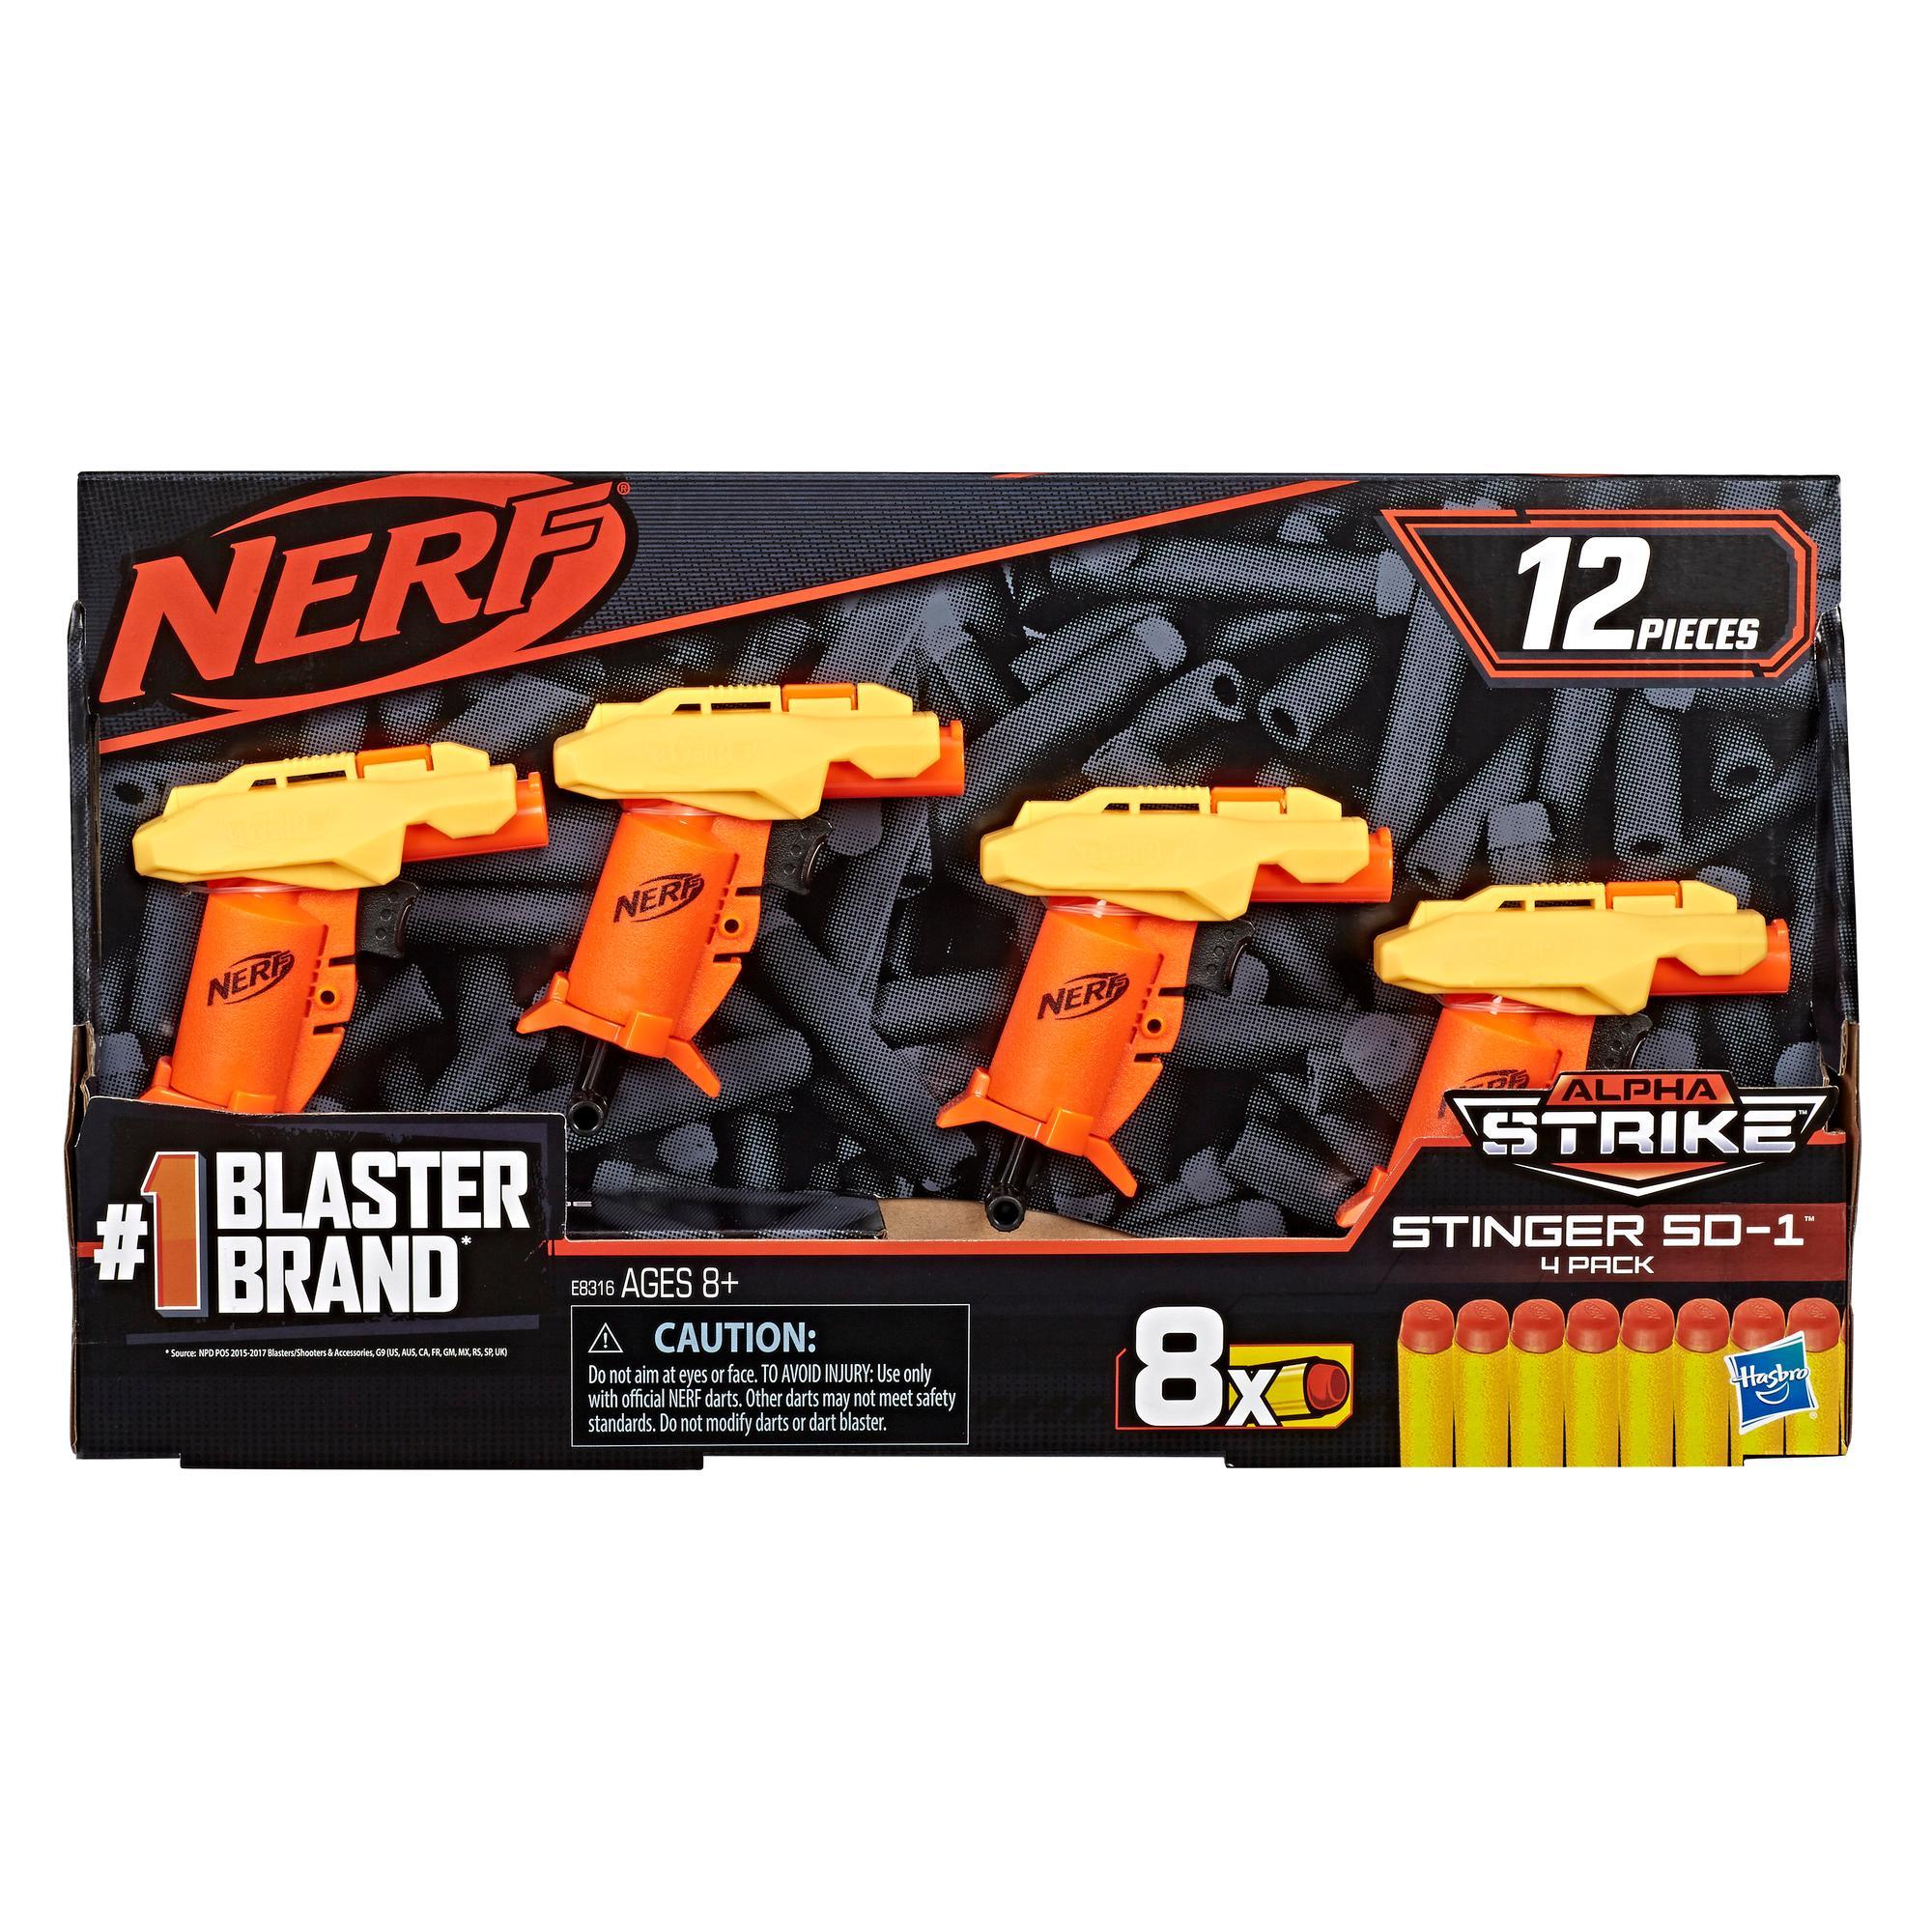 Ensemble de 4 blasters jouet Stinger SD-1 Nerf Alpha Strike